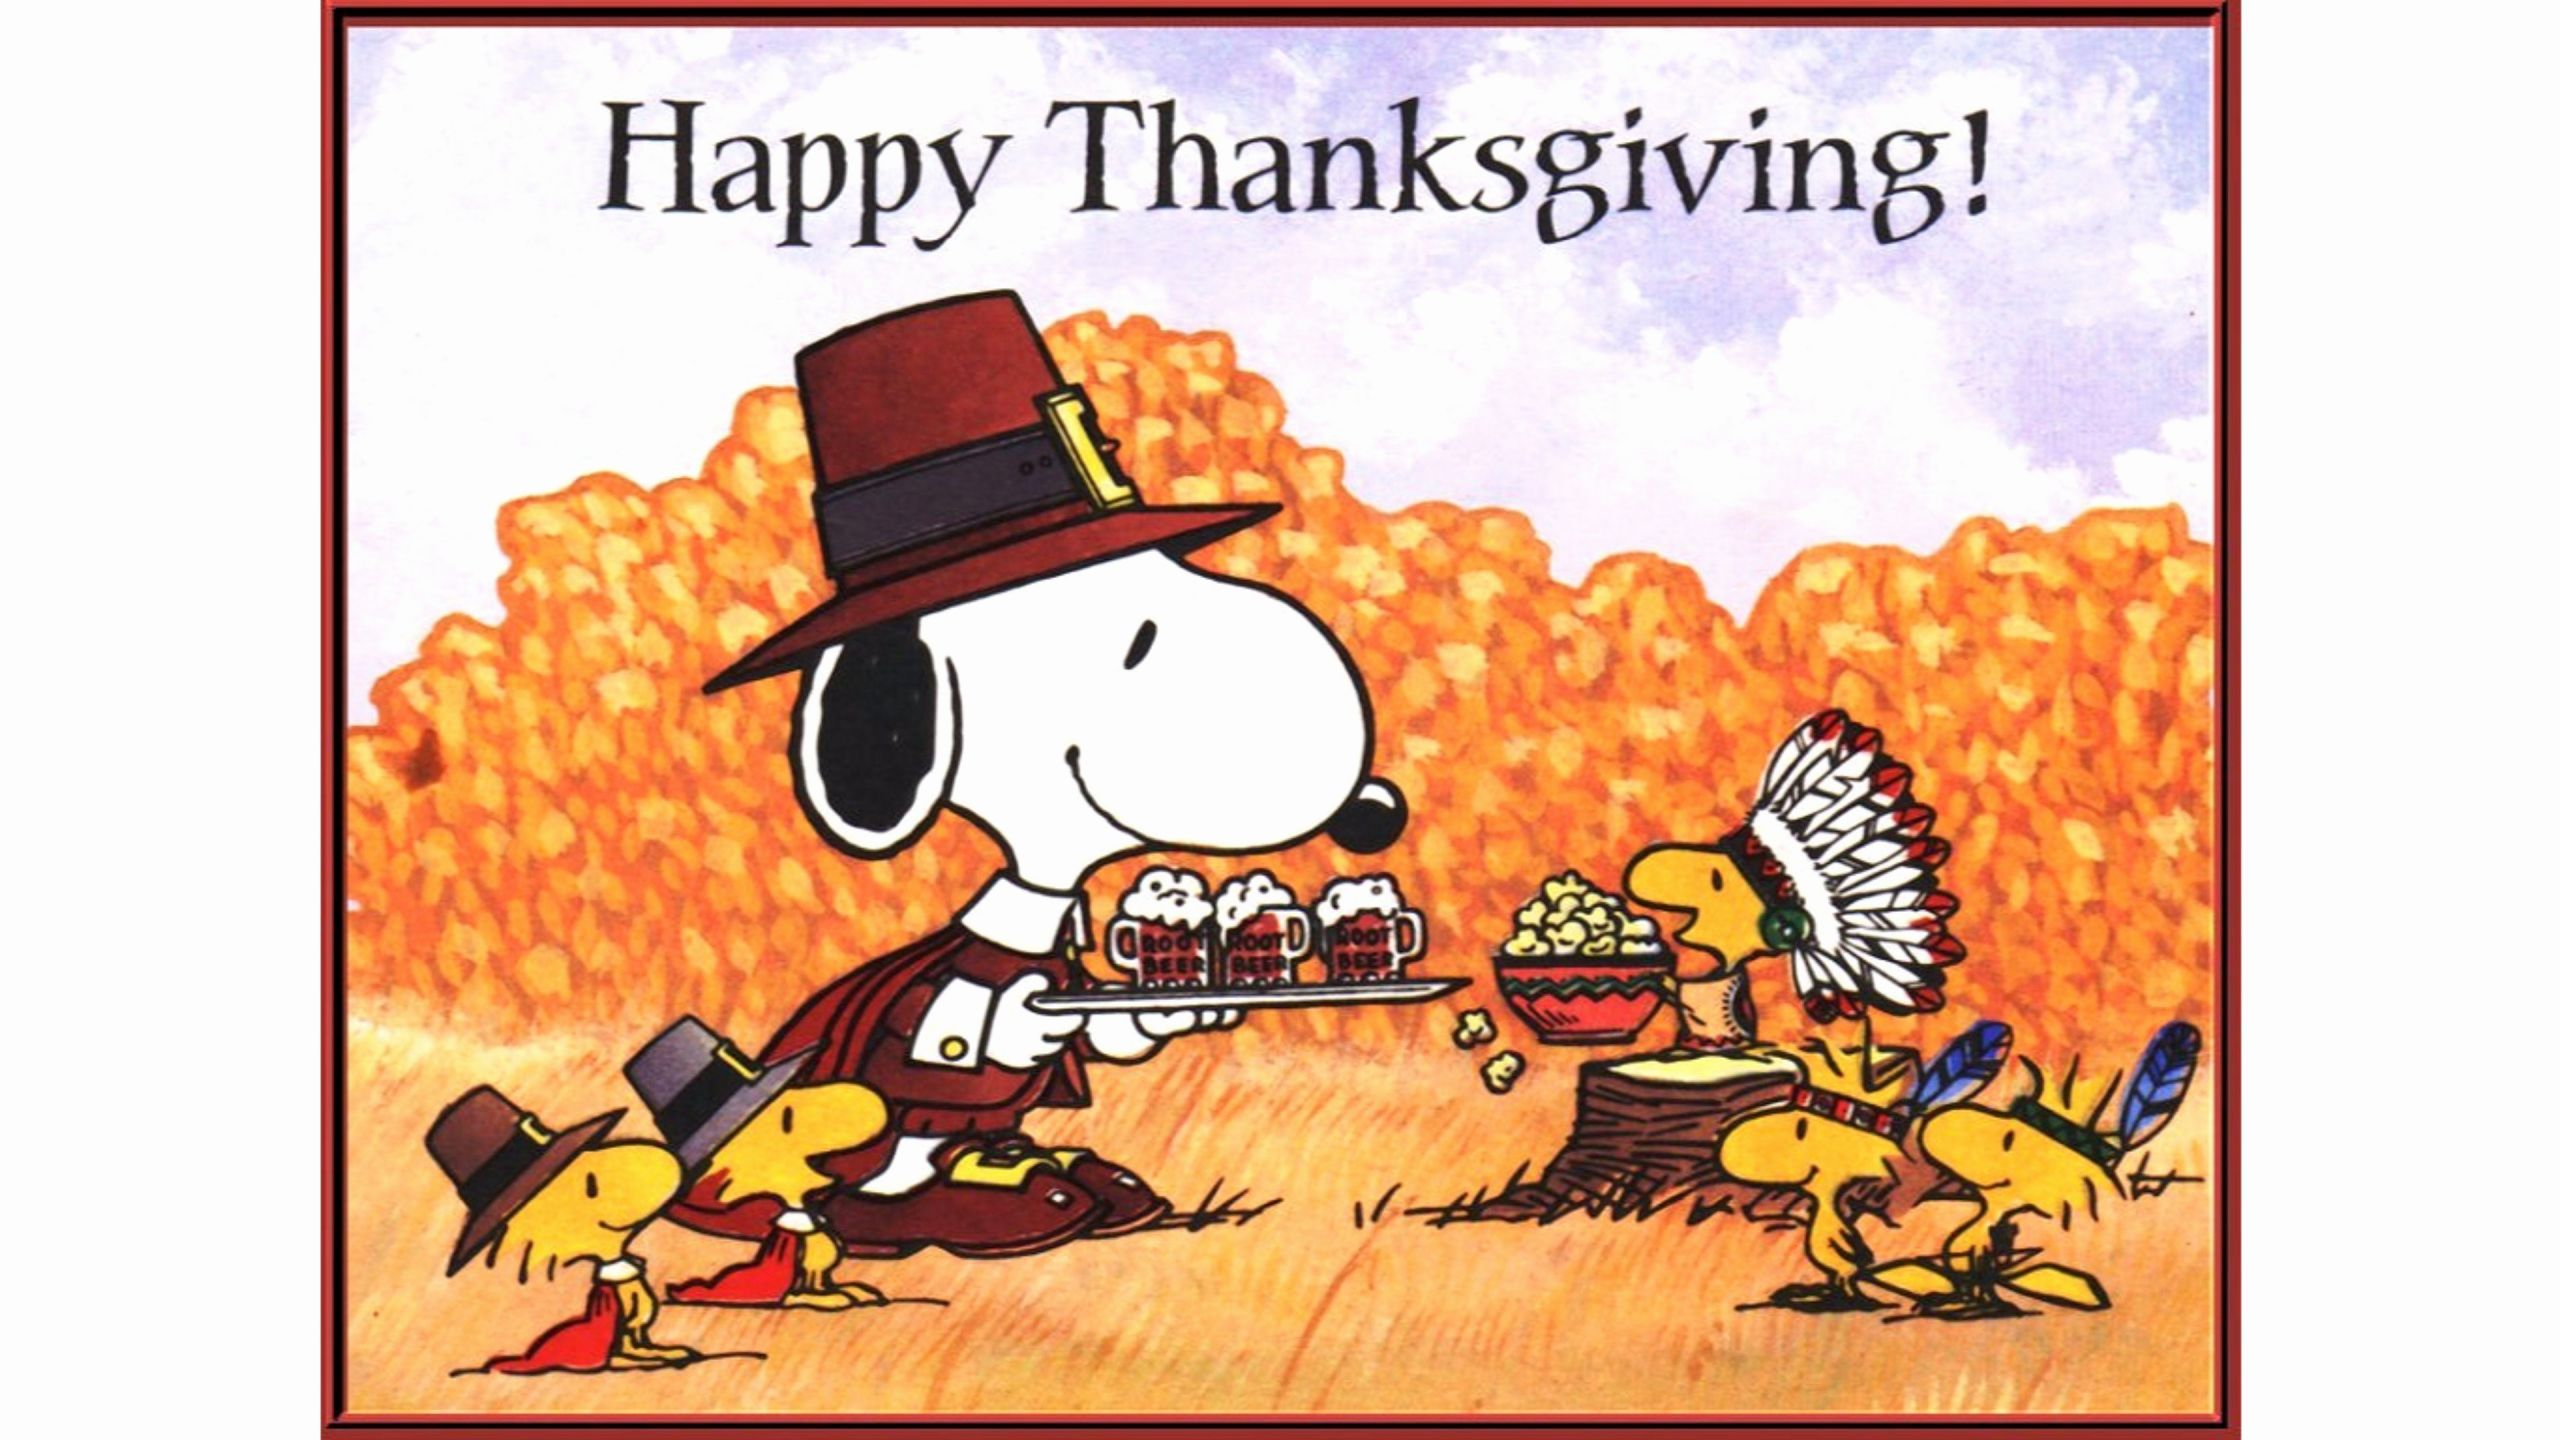 Happy Thanksgiving Wallpaper 2560x1440 Download Hd Wallpaper Wallpapertip